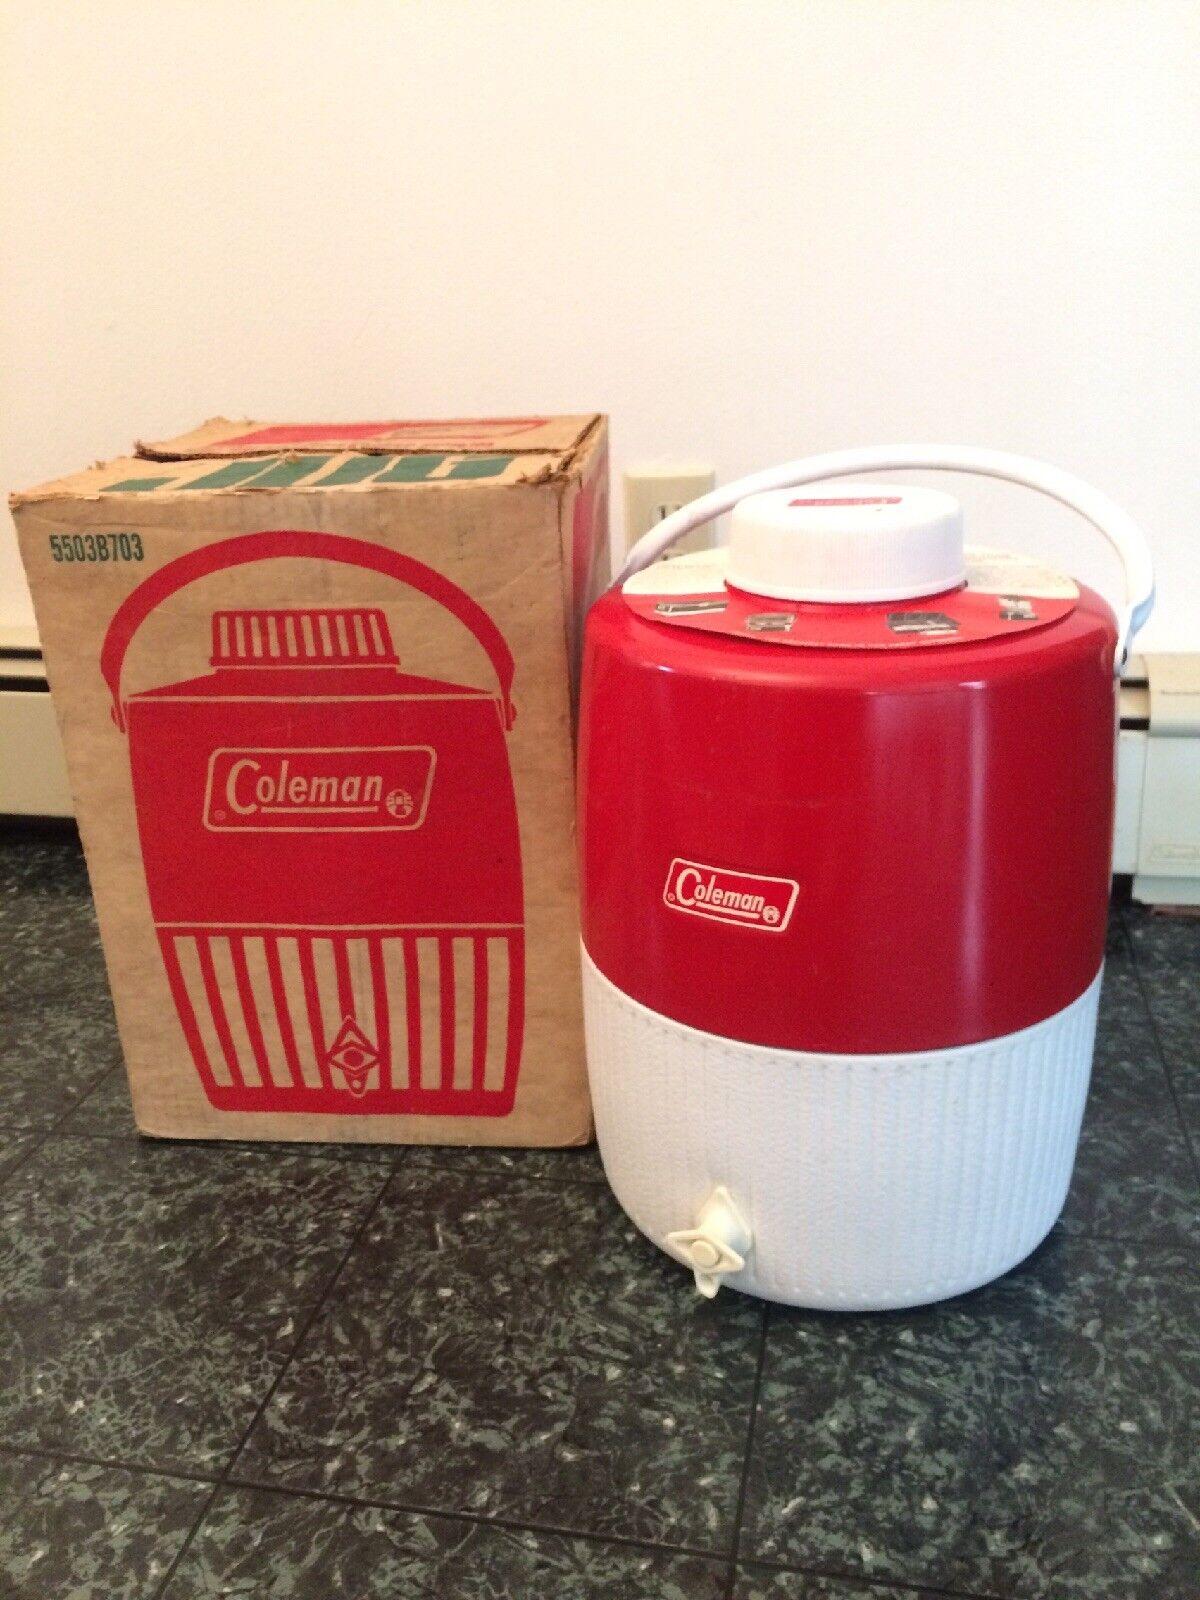 Vintage Coleman Red & White Metal & Plastic Cooler Jug-3 Gallon-5503B703